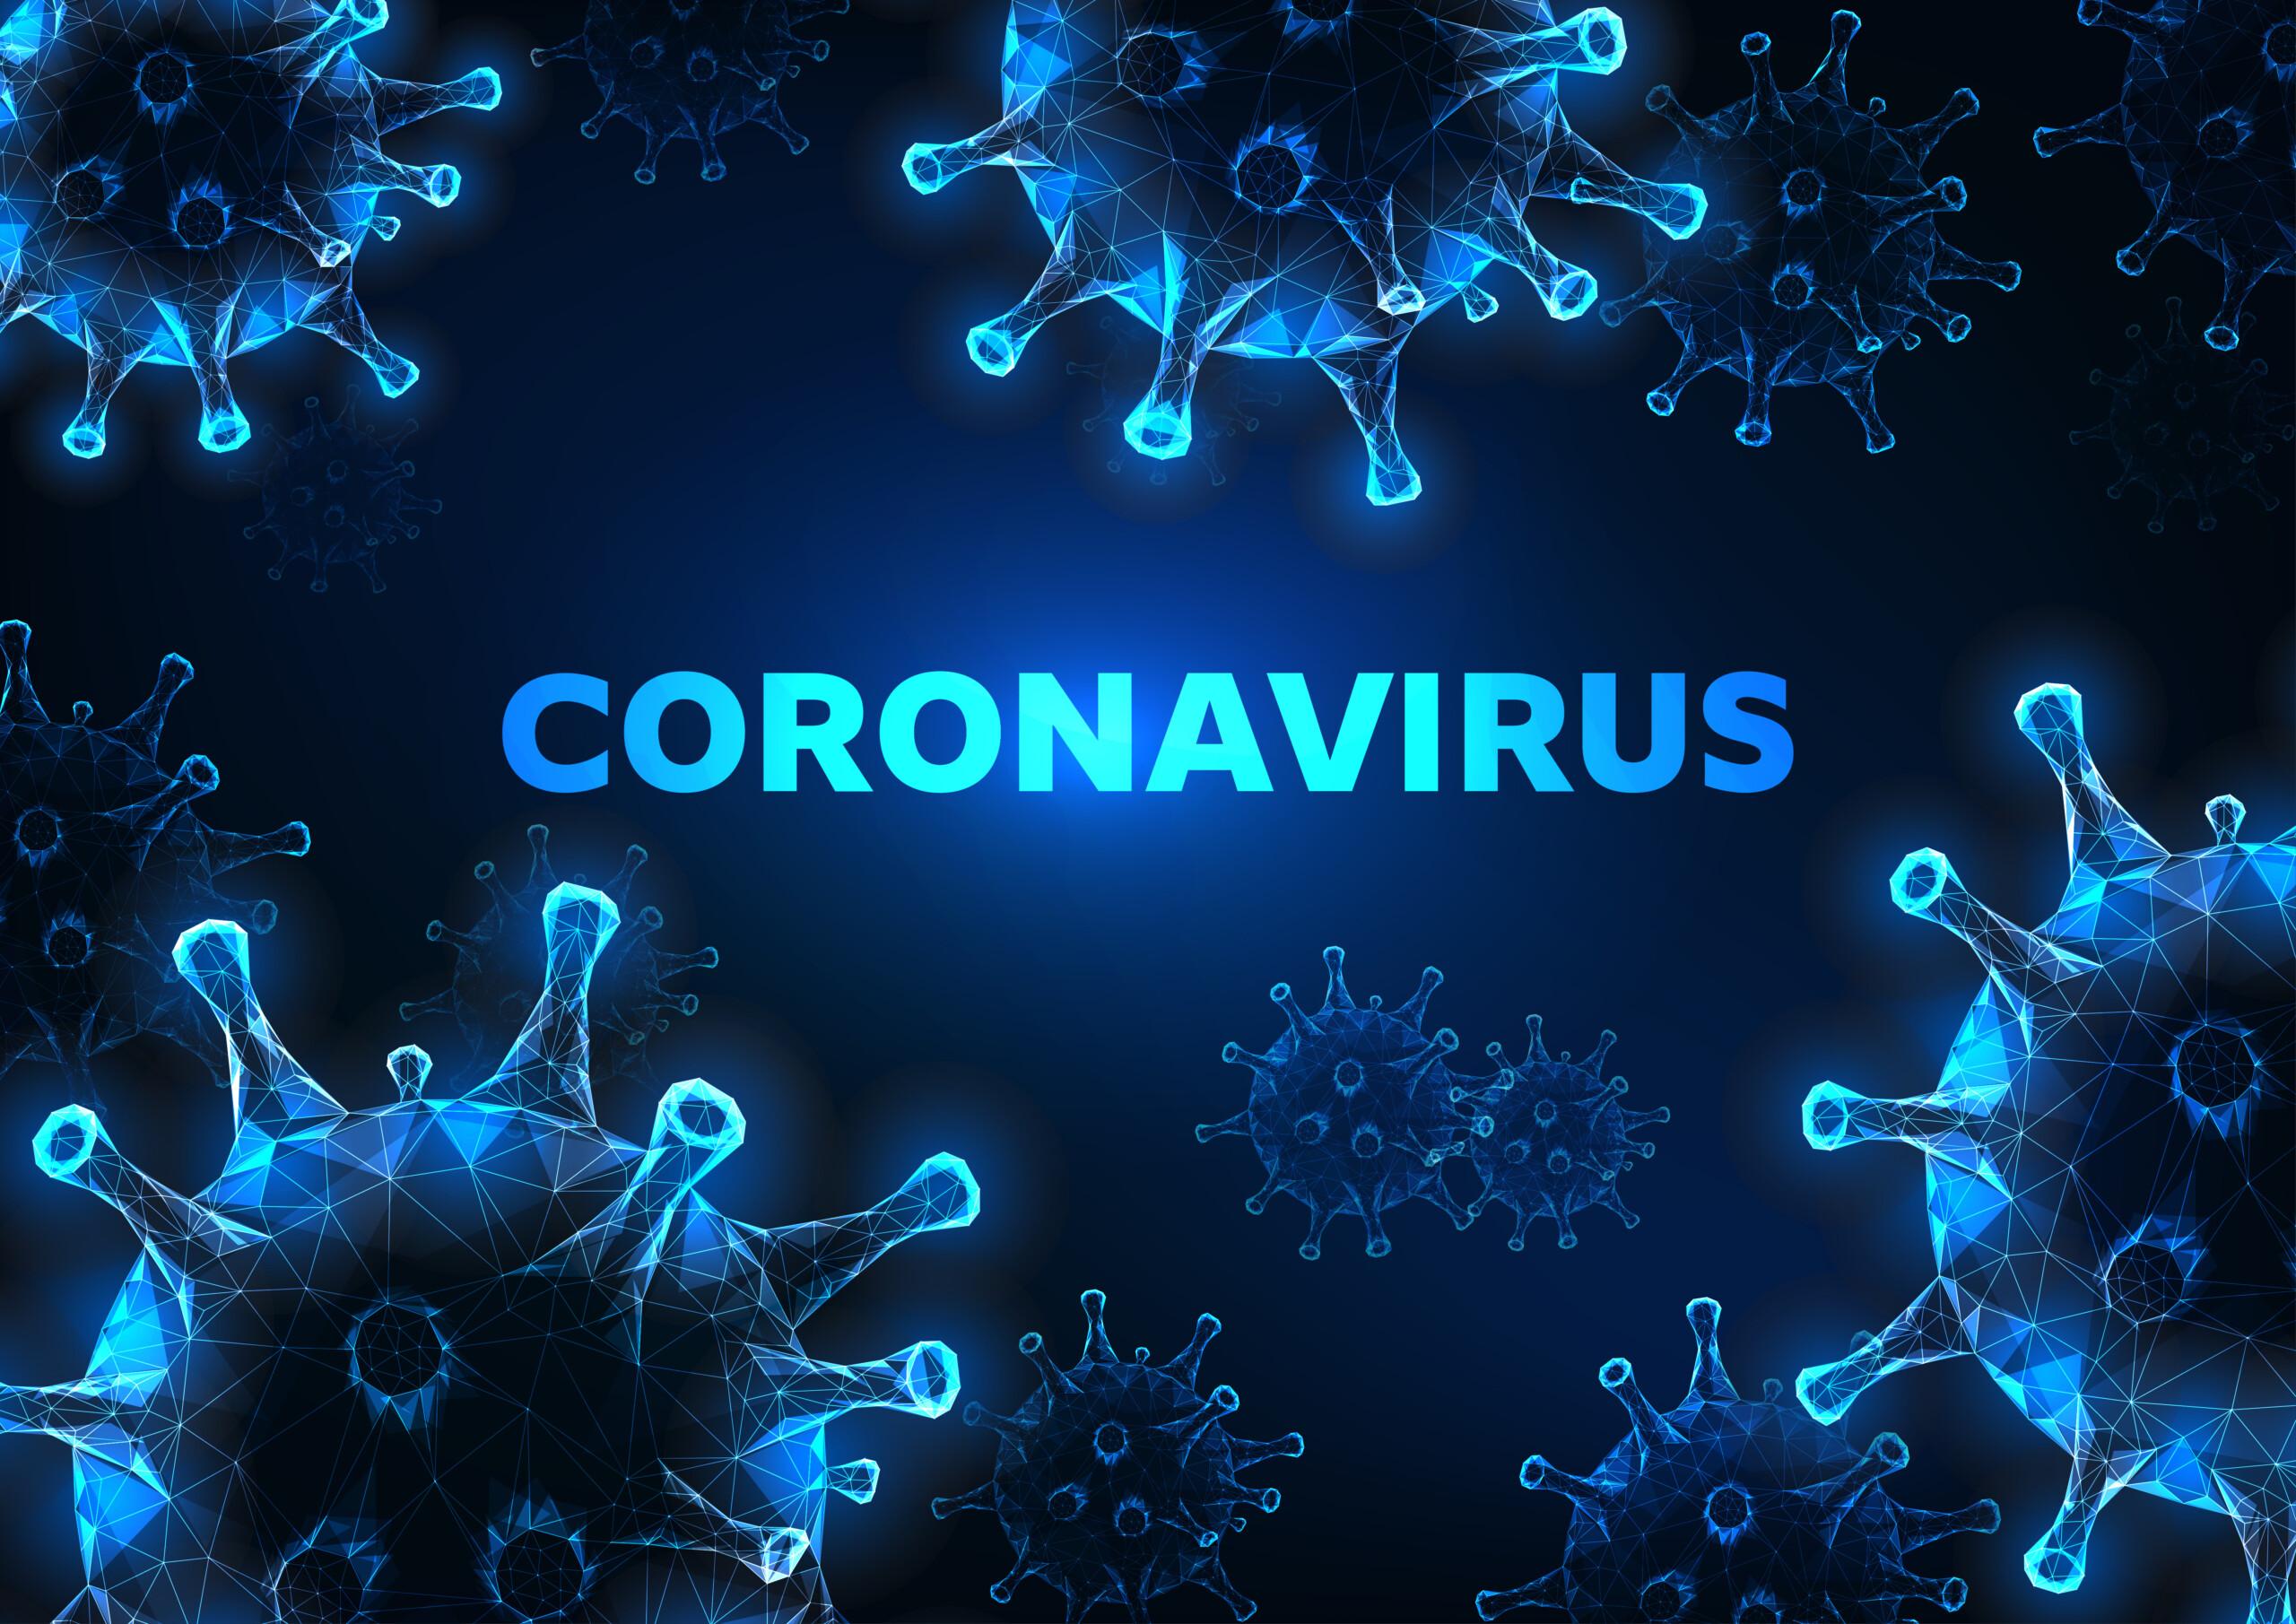 Corona Virus Impact on Mineral Rights